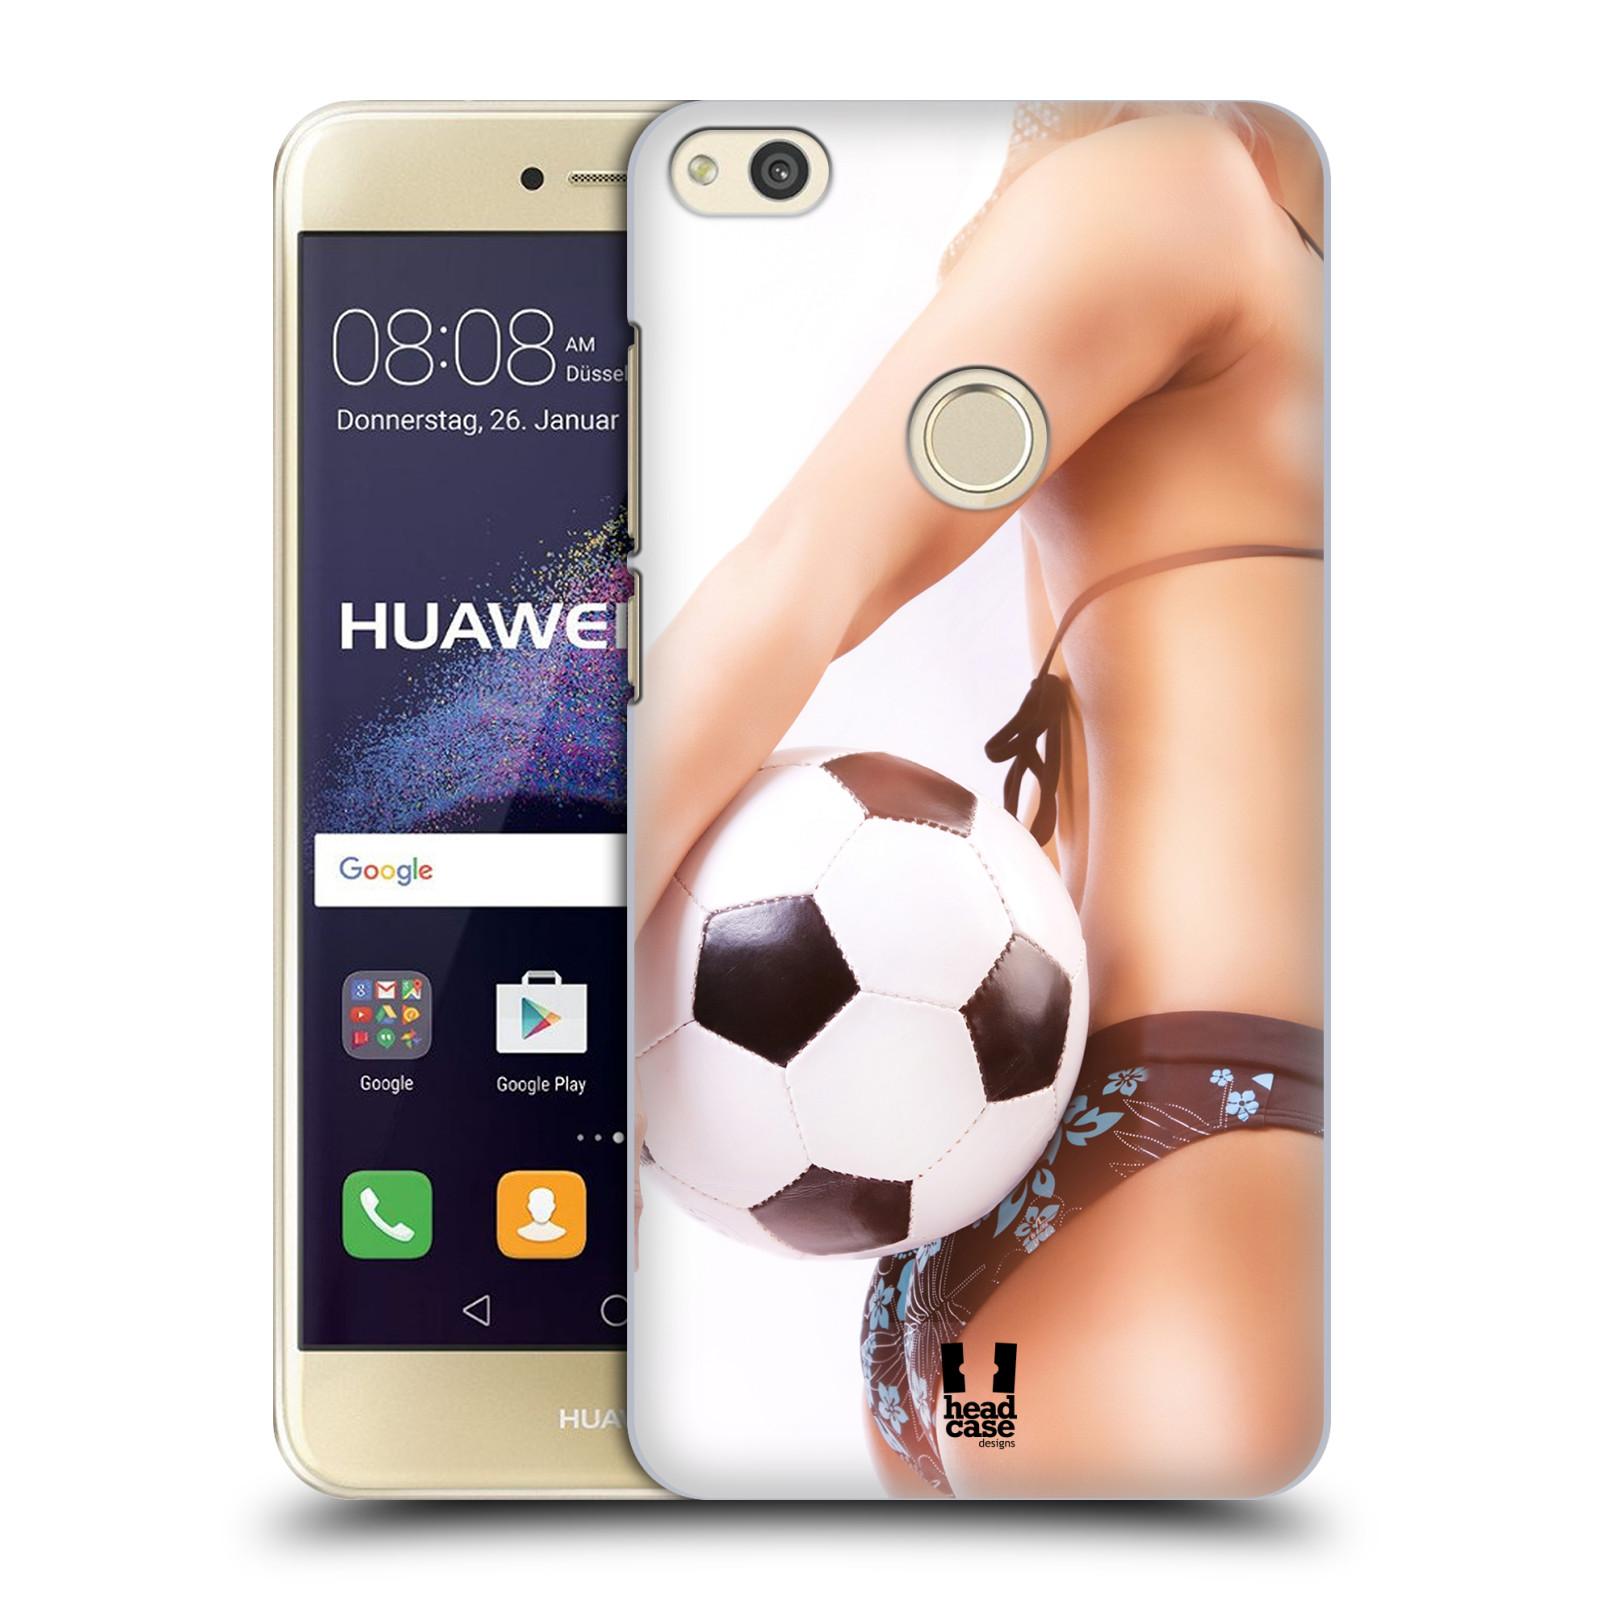 coque huawei p8 lite 2017 football